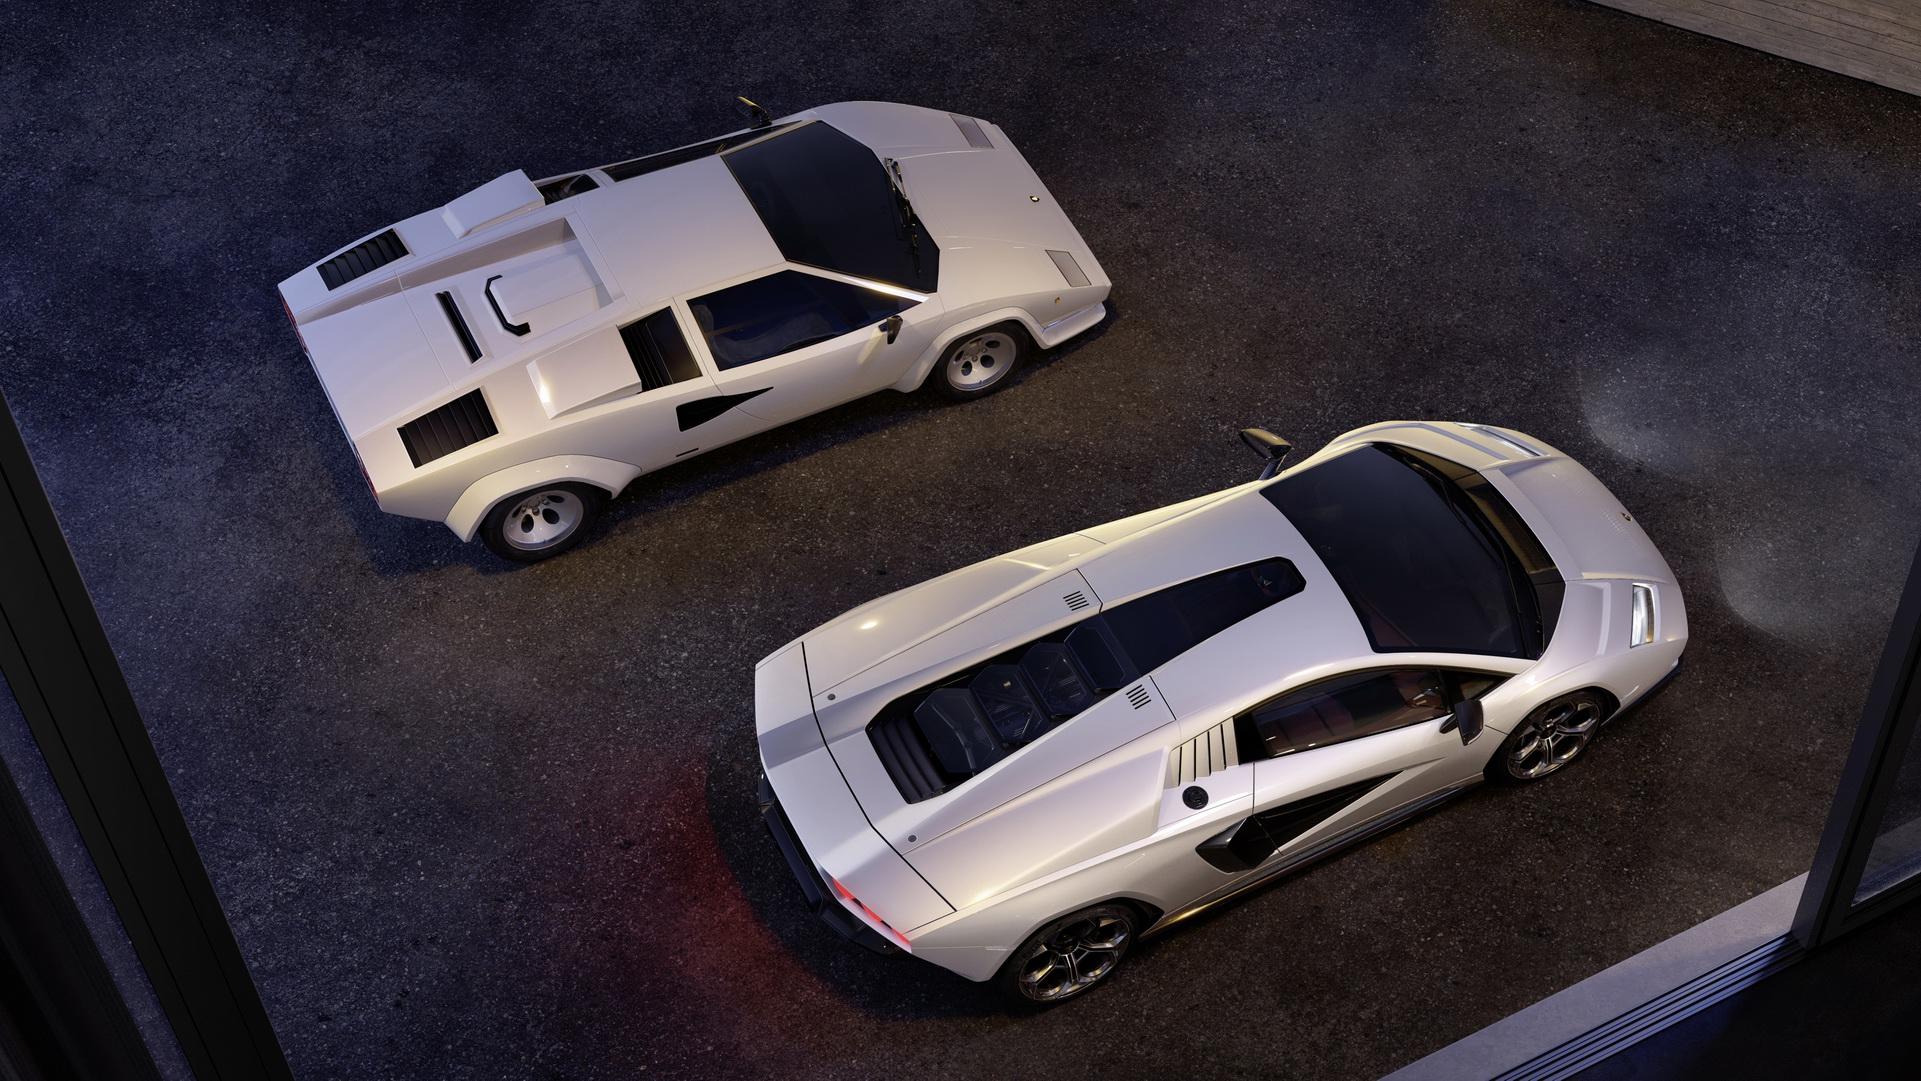 2022 Lamborghini Countach LPI 800-4 Top Wallpapers (9)